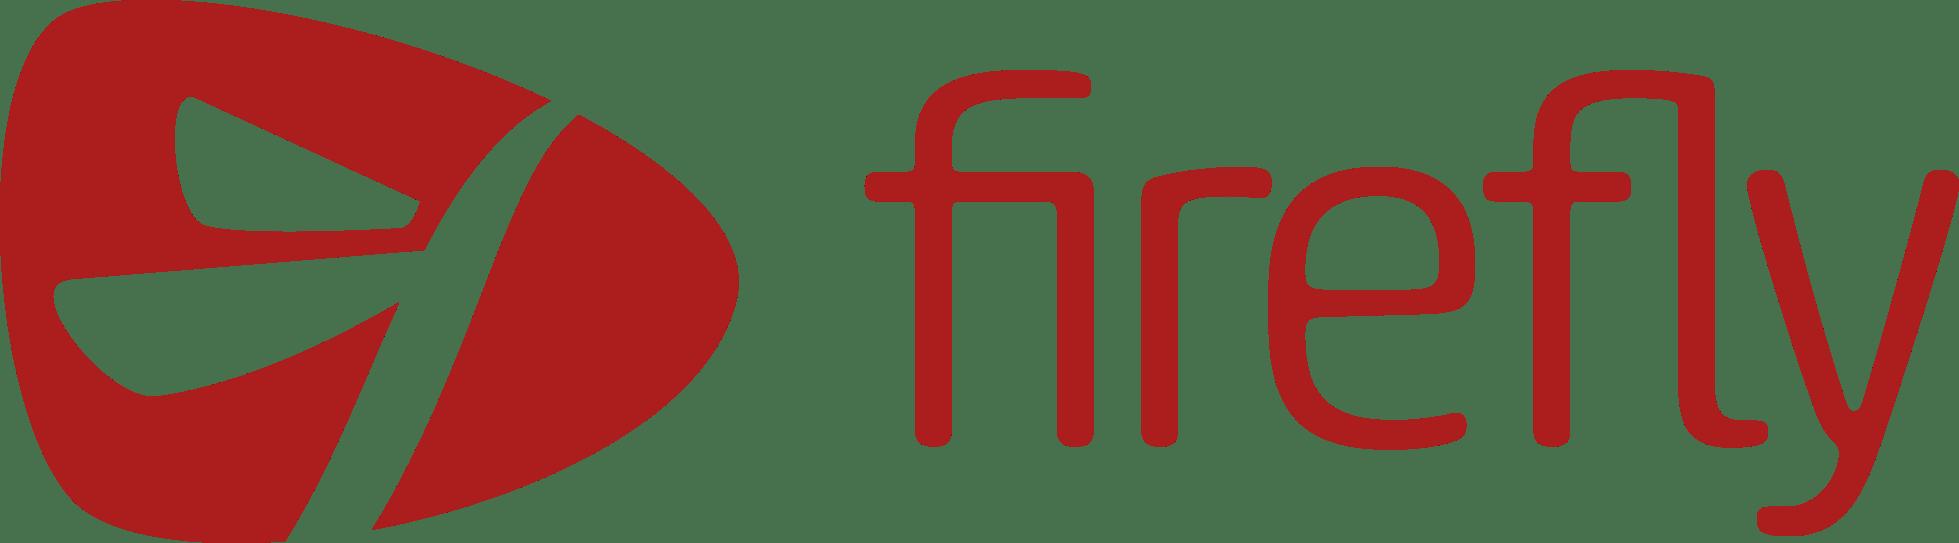 WCBS Firefly Partnership